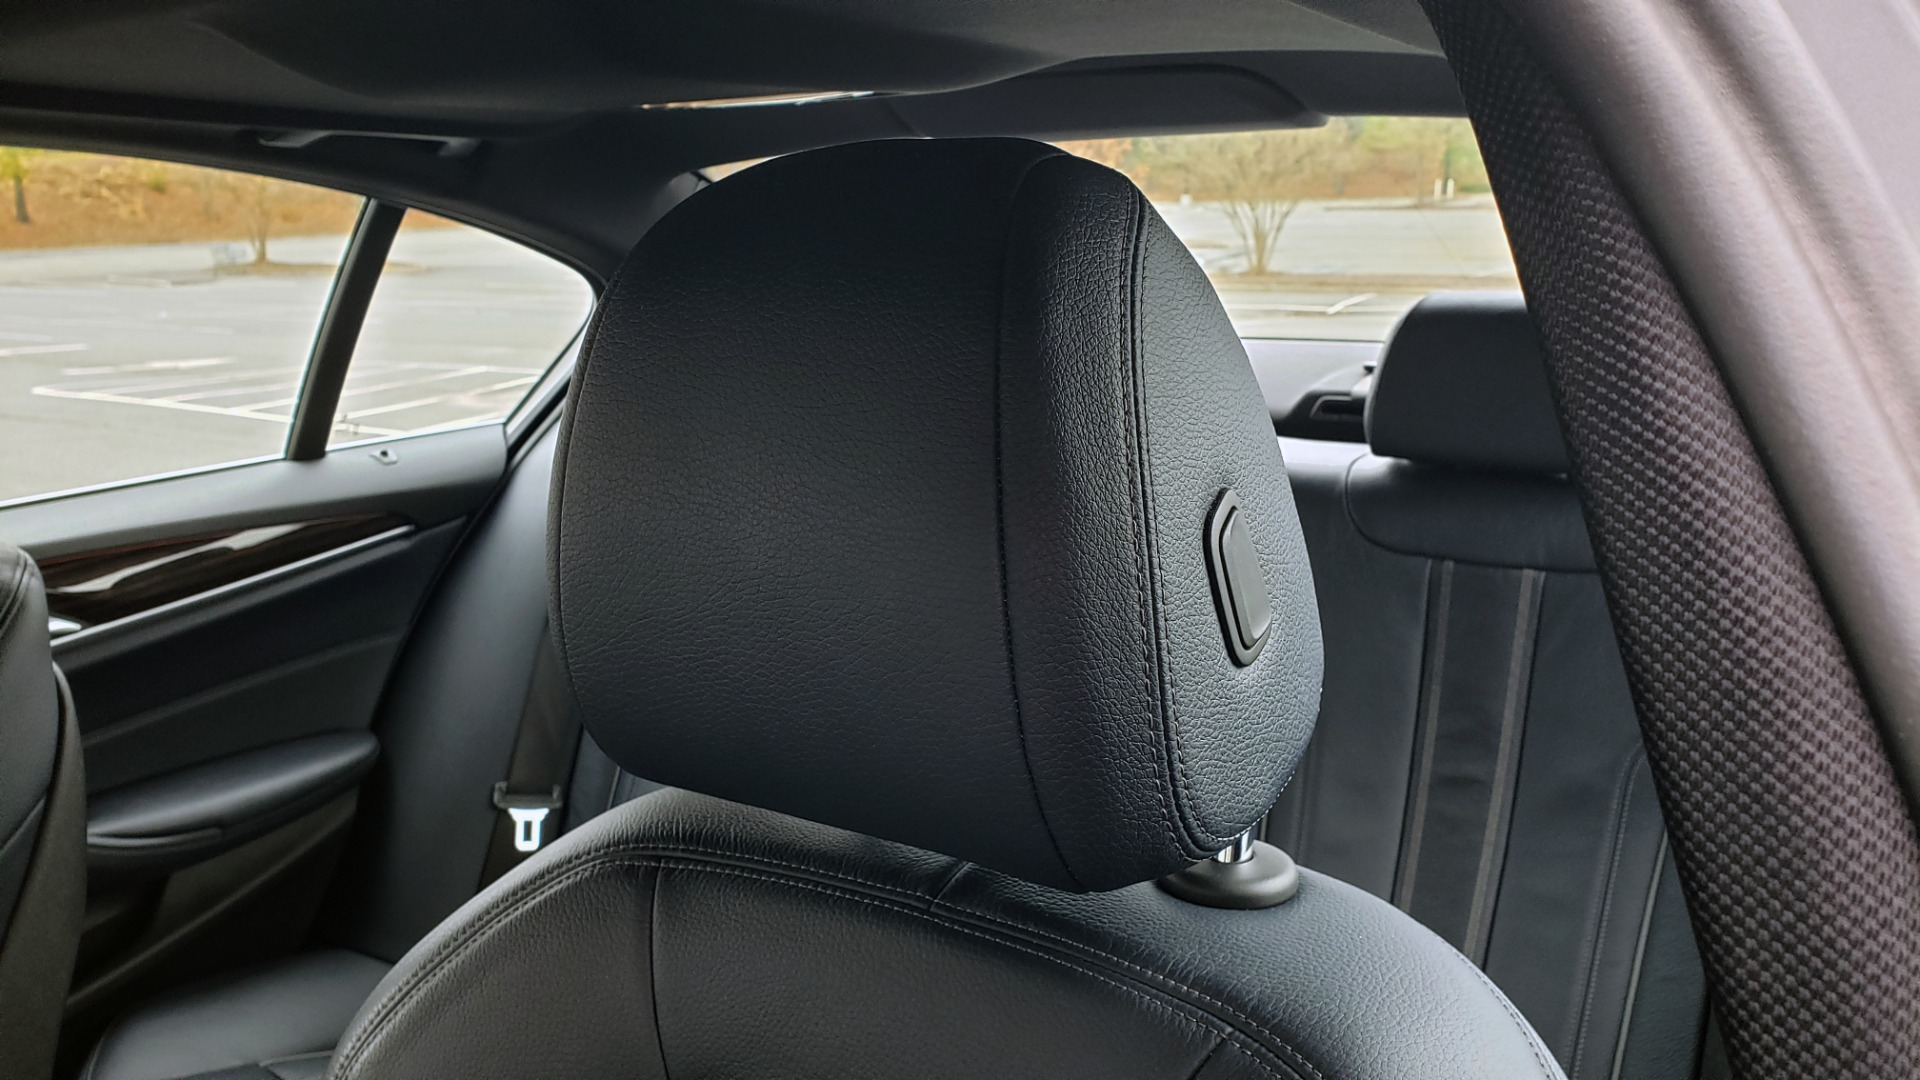 Used 2017 BMW 5 SERIES 530IXDRIVE / PREM PKG / DRVR ASST PLUS / CLD WTHR / APPLE CARPLAY for sale Sold at Formula Imports in Charlotte NC 28227 35